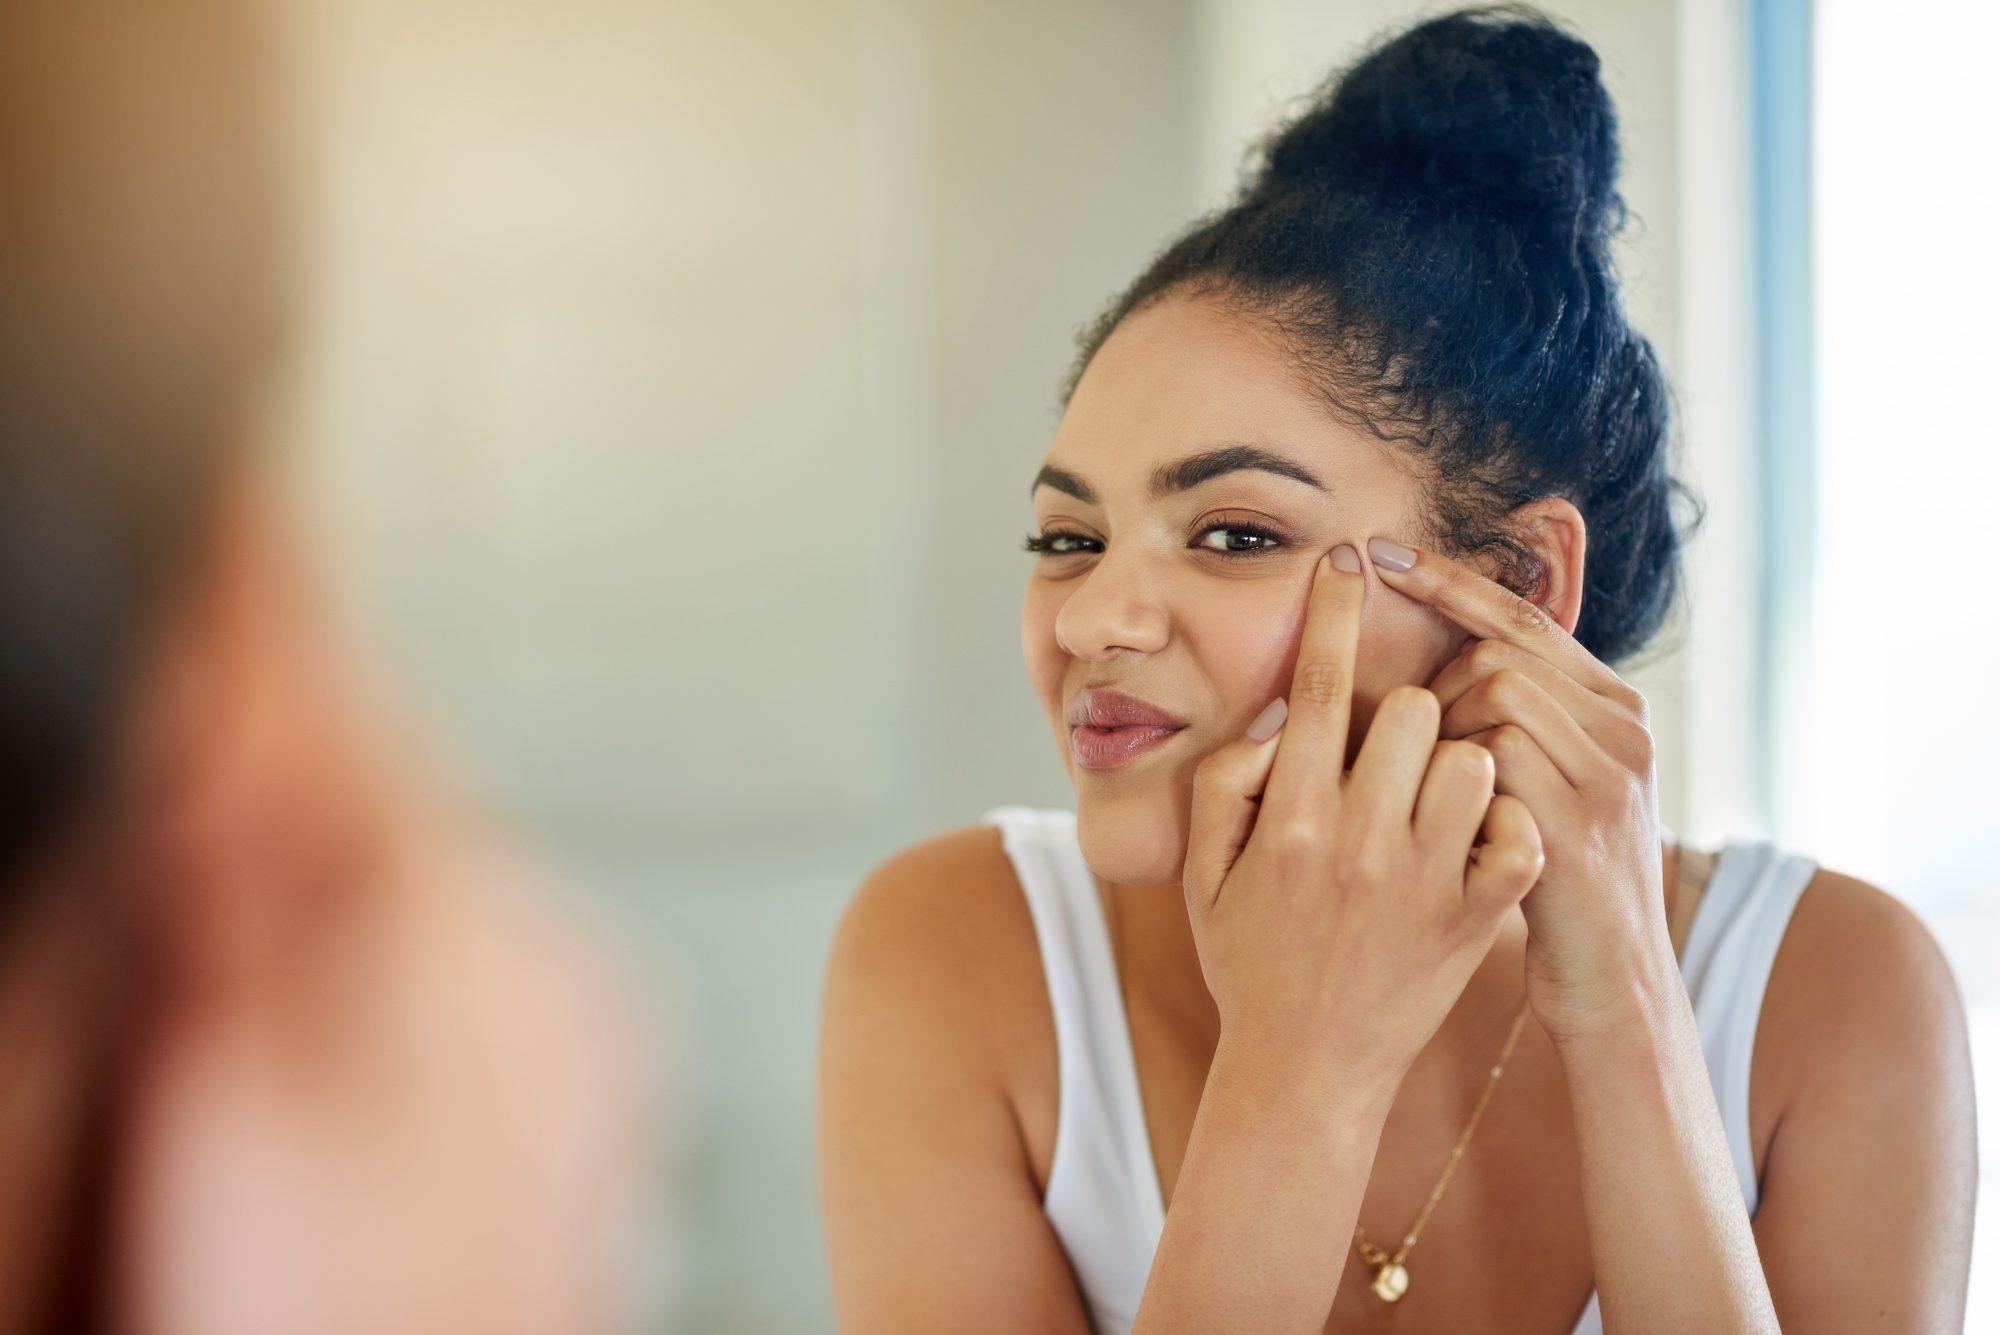 mejor producto para el acne, first aid beauty